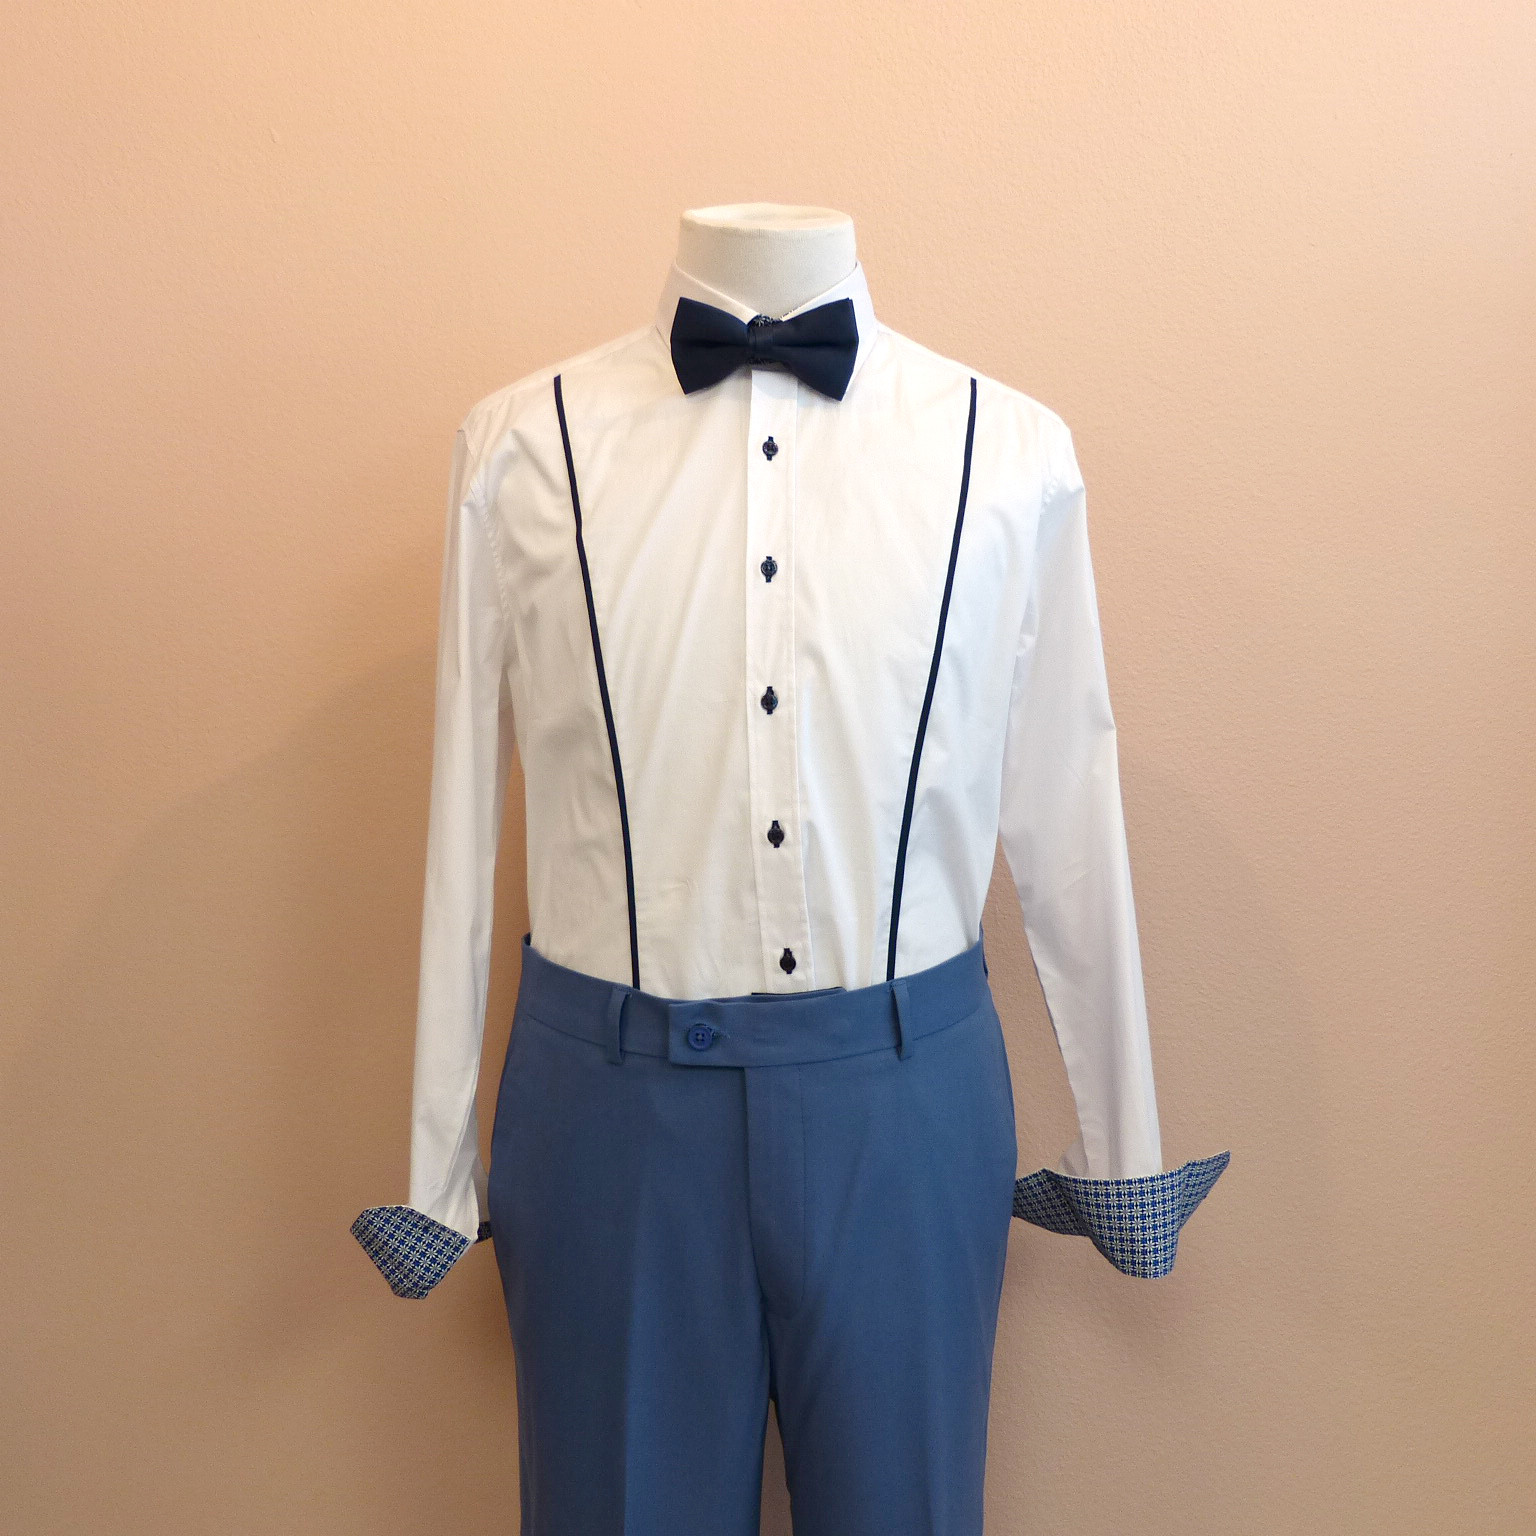 SRT001_Piping detail shirt